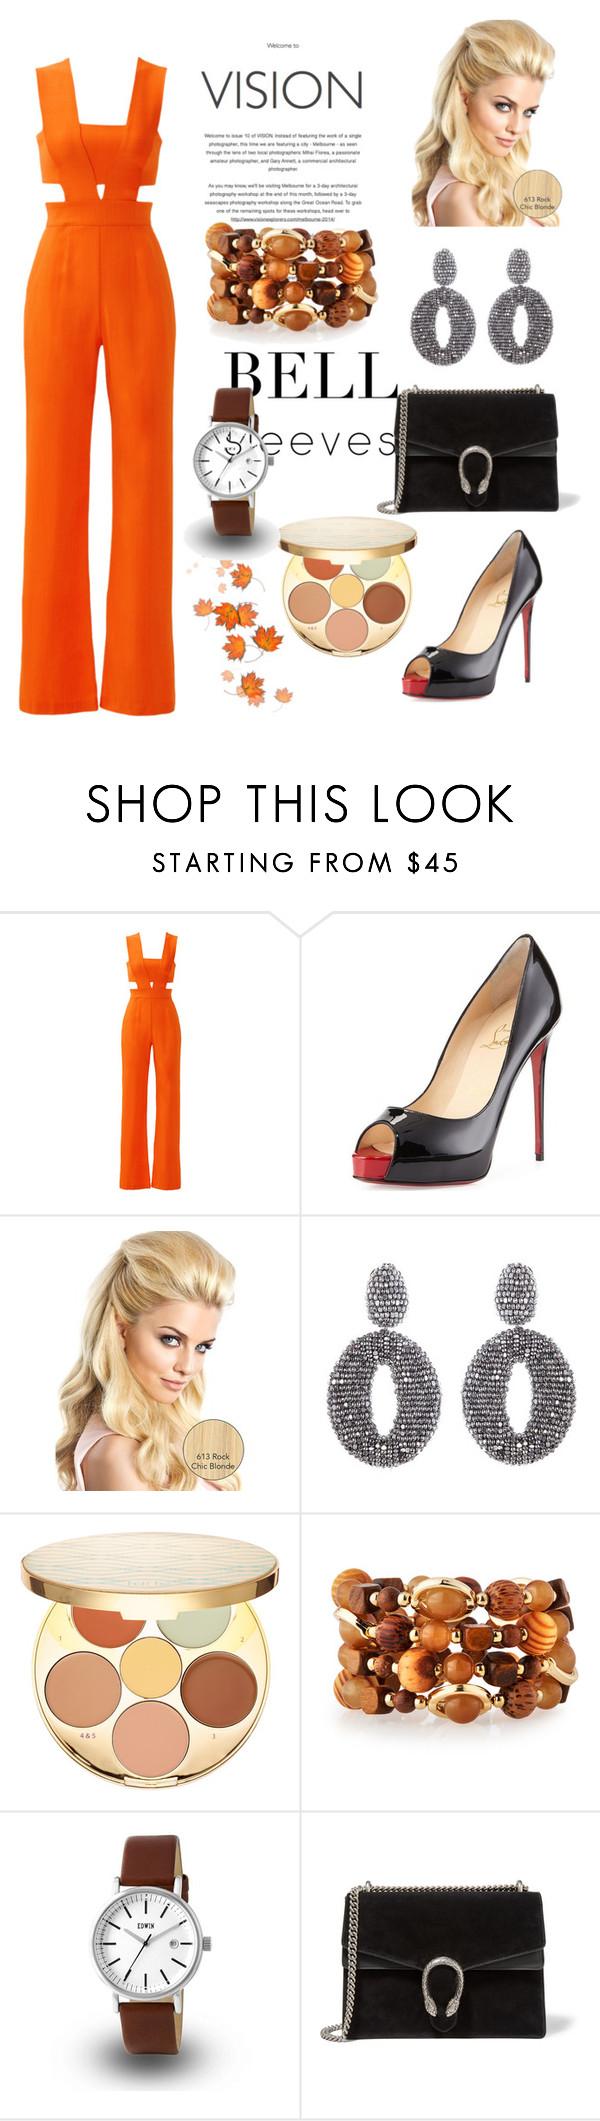 """Fashion Lady~"" by amy0527 ❤ liked on Polyvore featuring Karina Grimaldi, Christian Louboutin, Oscar de la Renta, tarte, Emily & Ashley and Gucci"